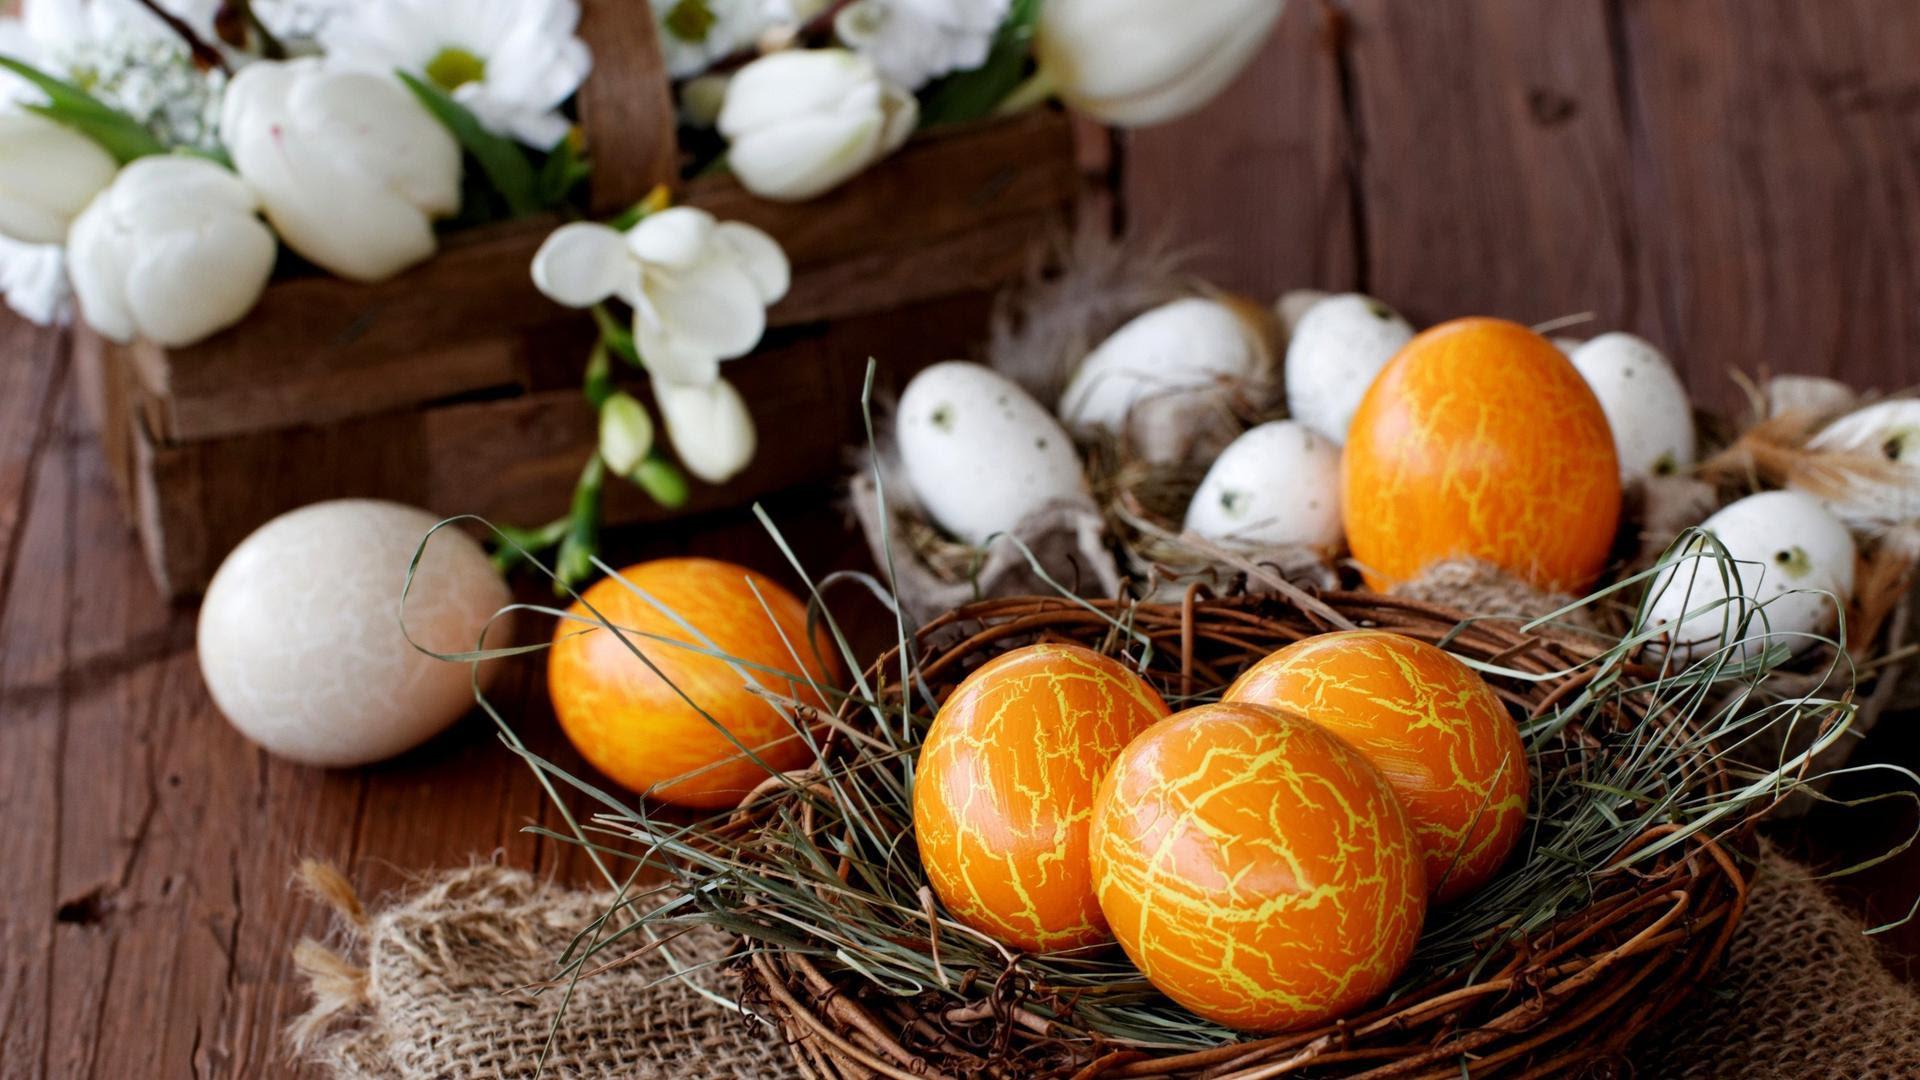 Wallpaper Download 1920x1080 Orange Easter eggs - HD ...